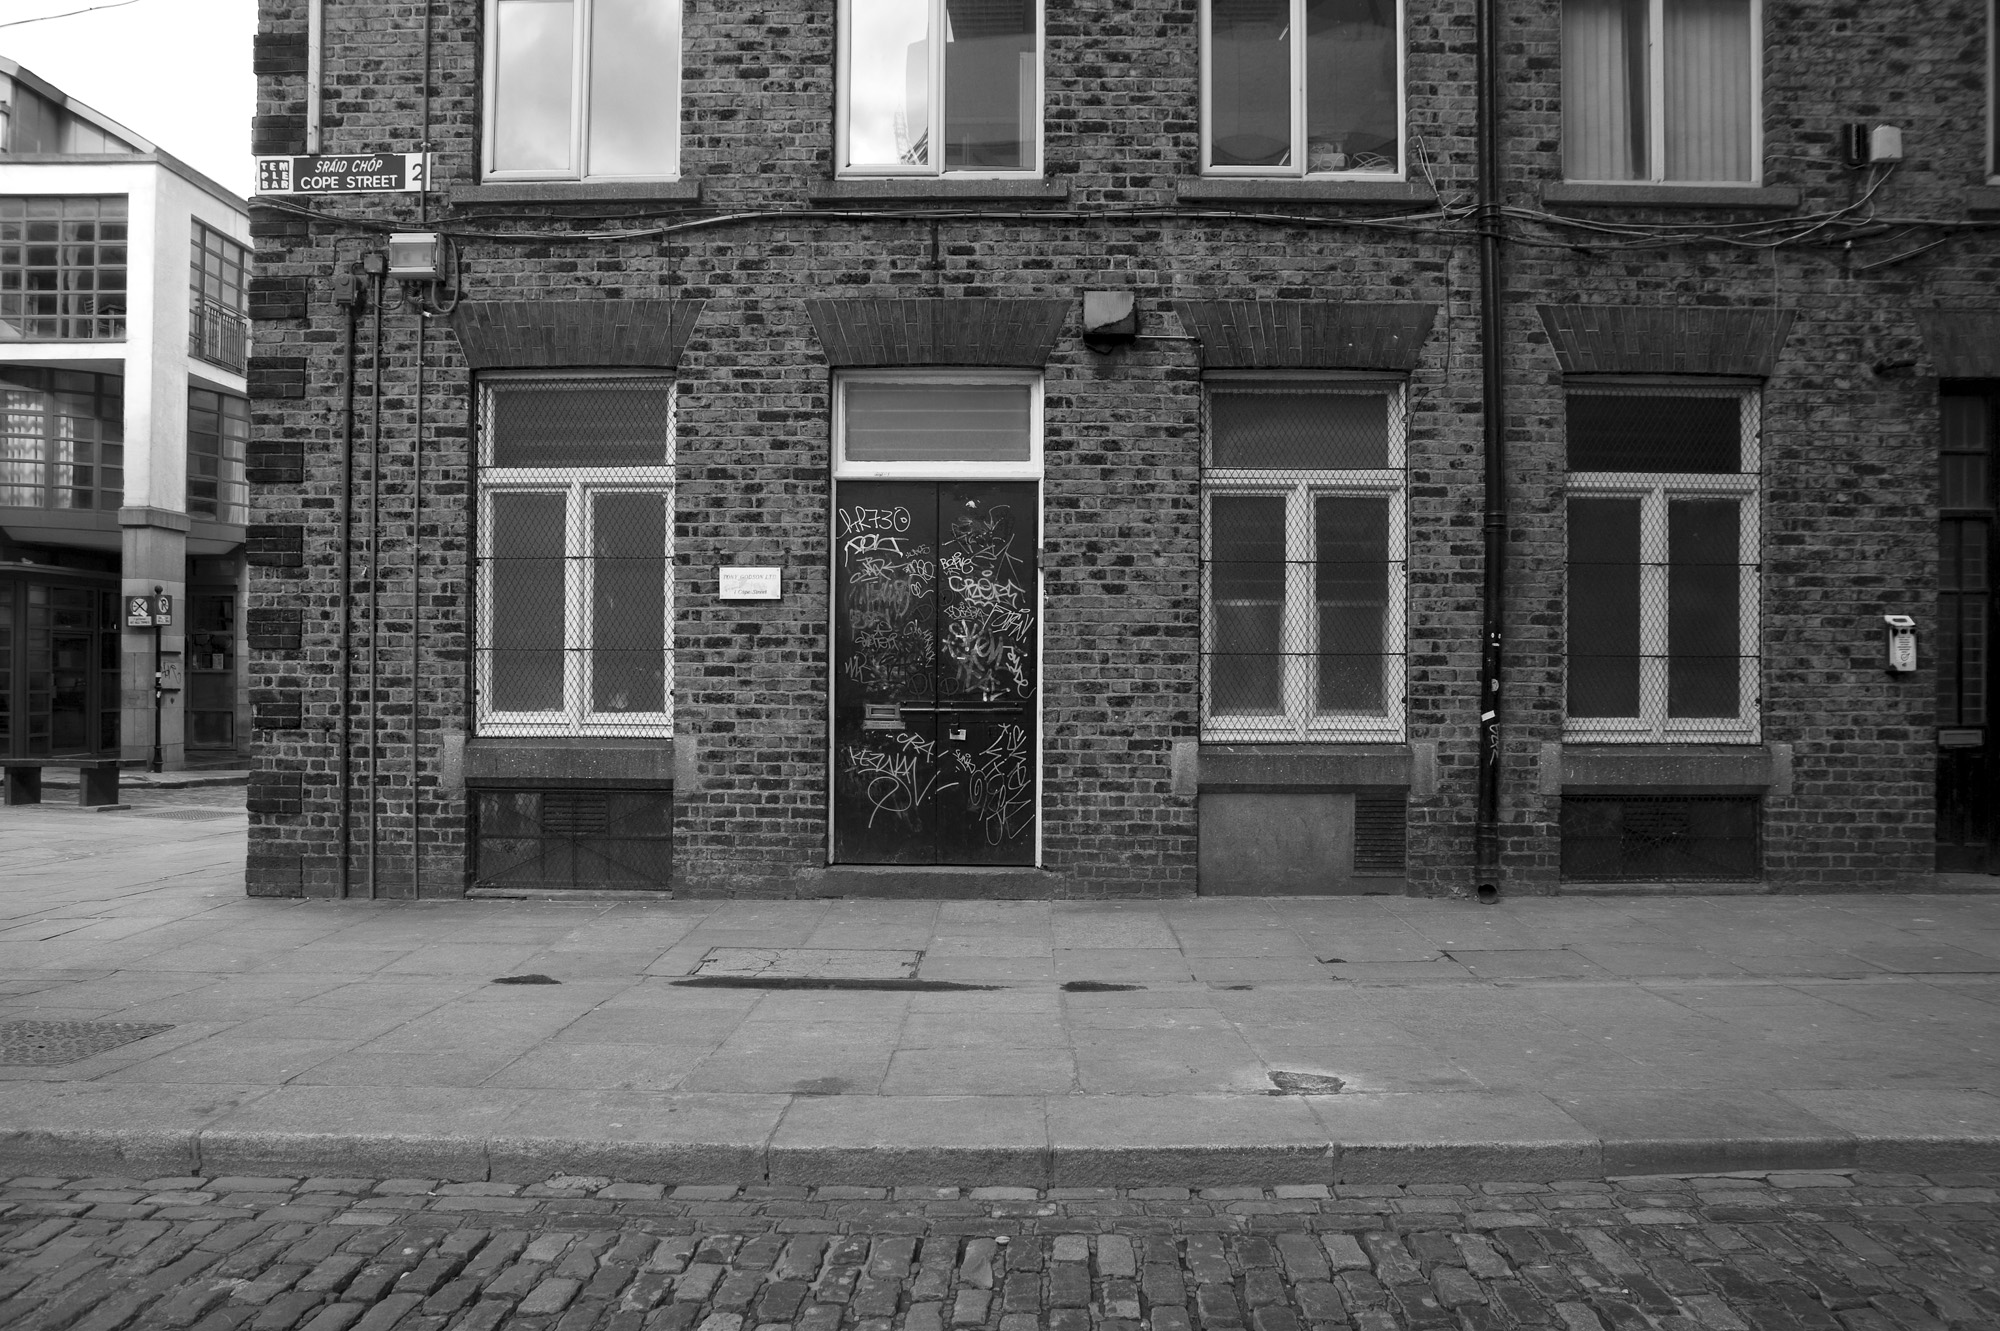 cope-street-dublin-2009